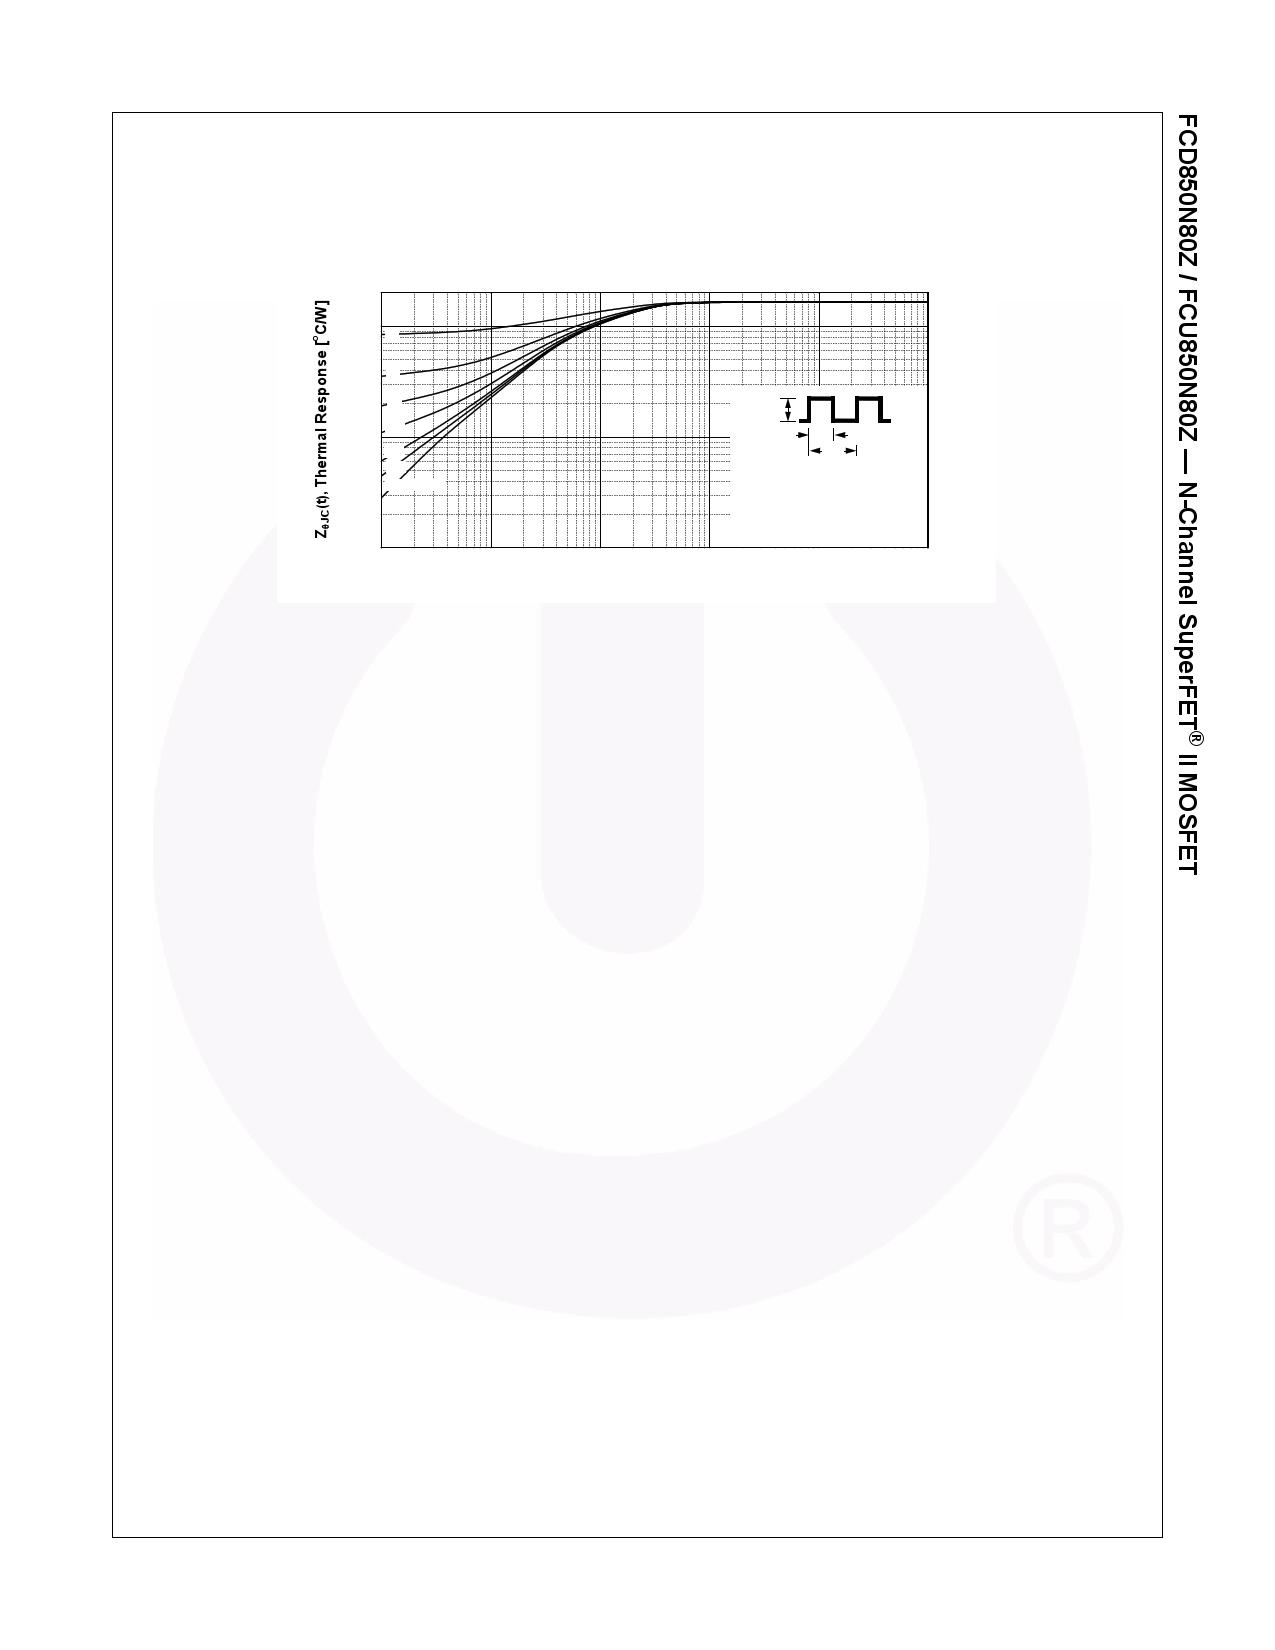 FCD850N80Z pdf, arduino